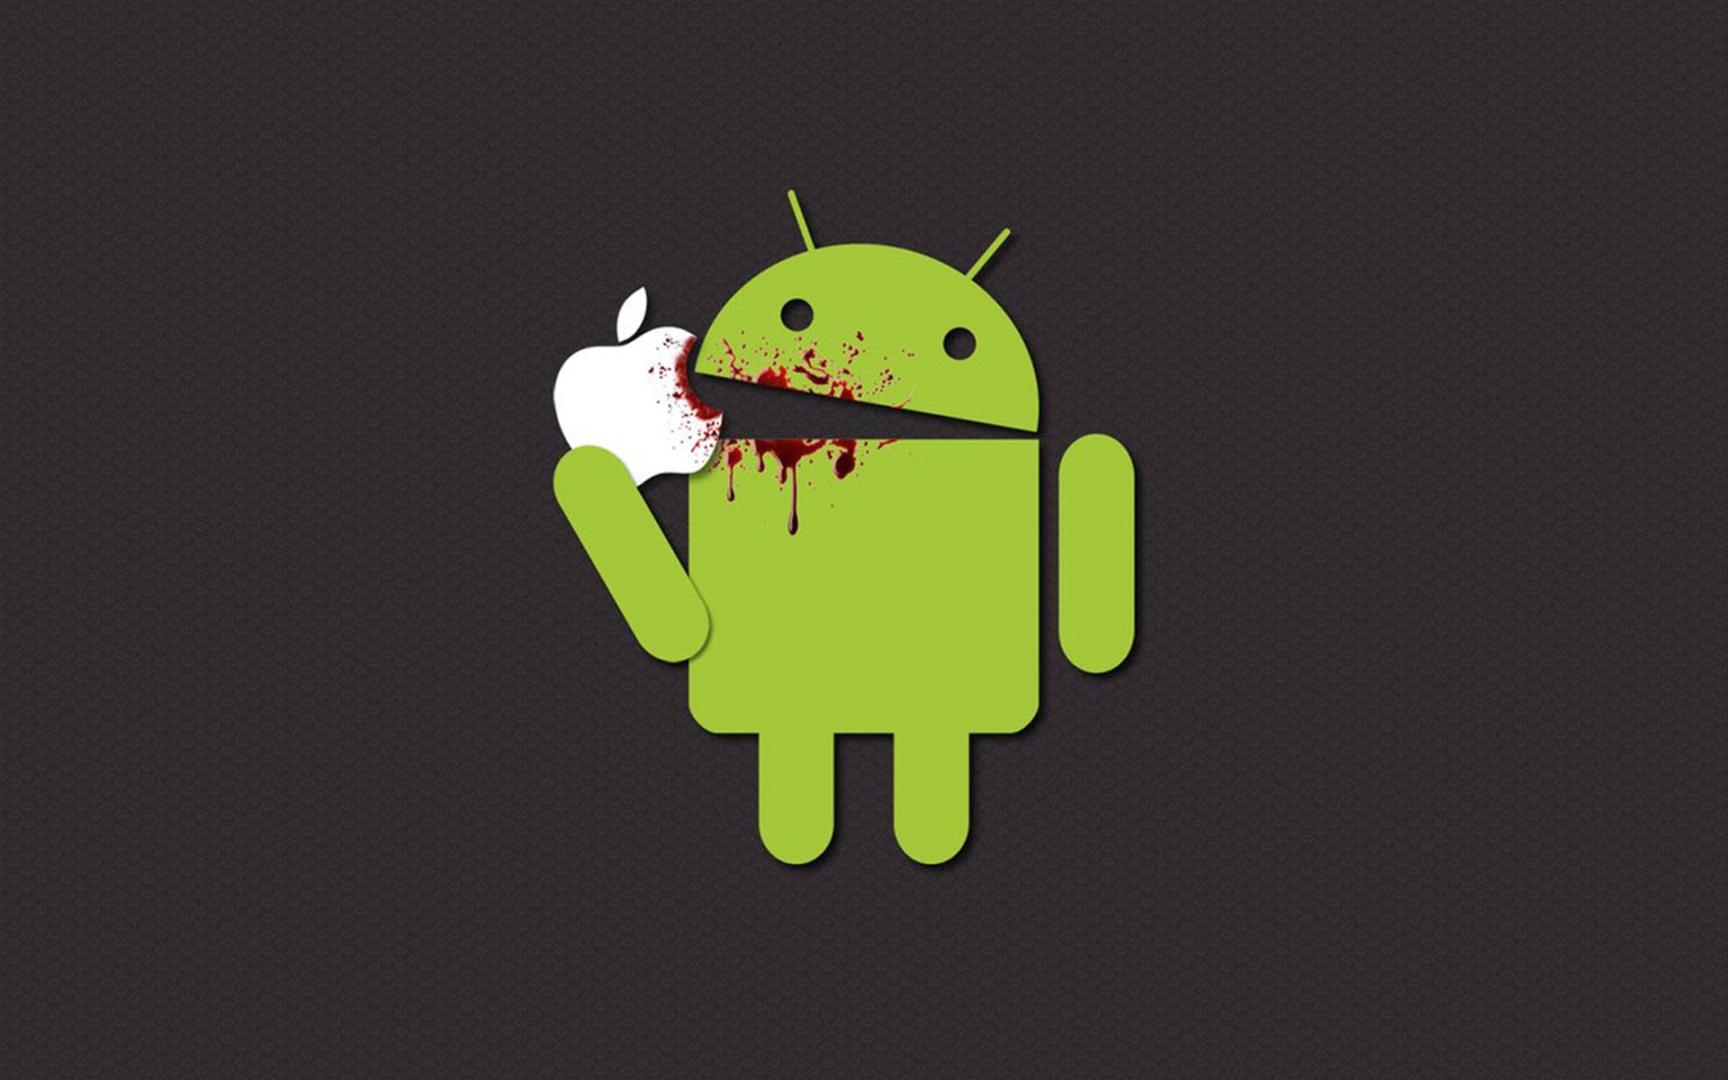 android apple yum yum